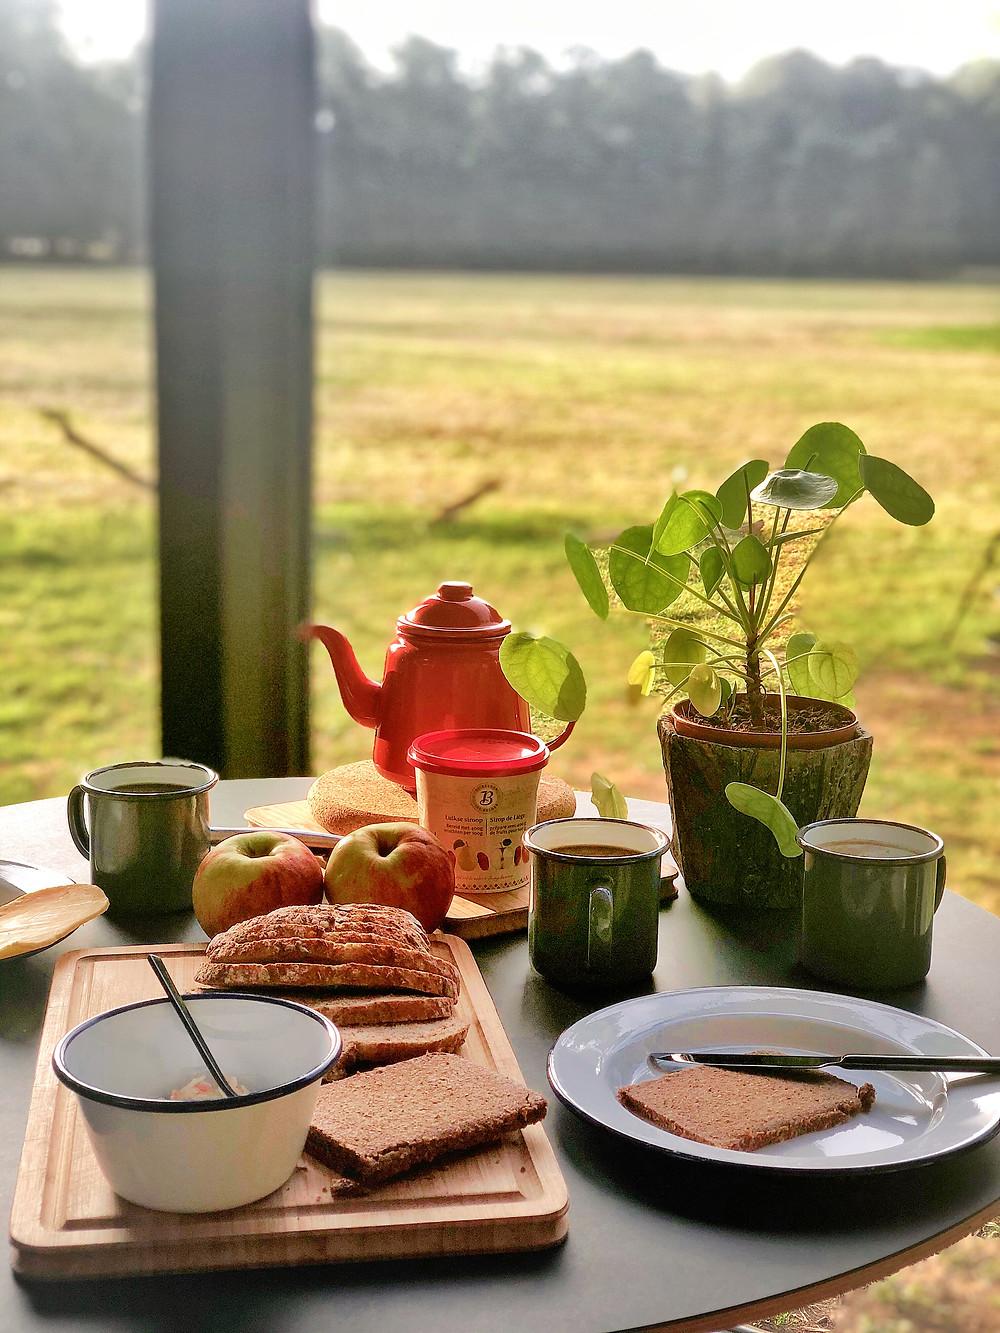 Breakfast at Slow Cabins Belgium